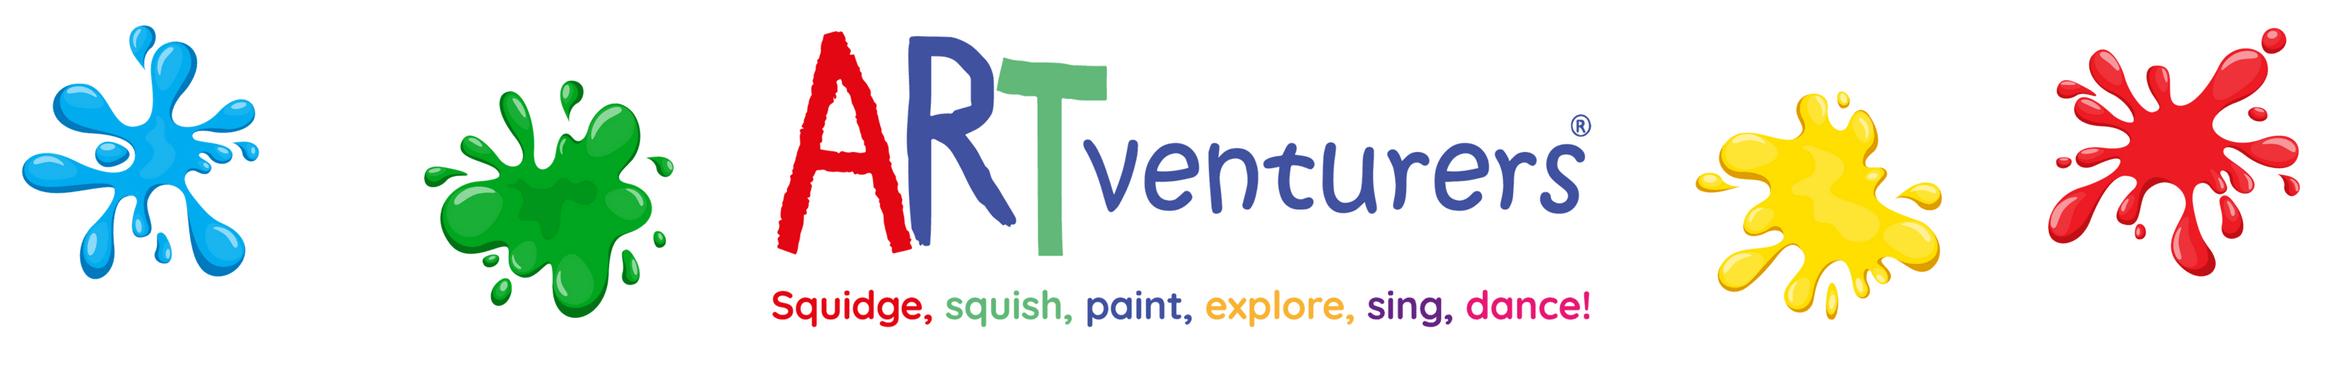 ARTventurers Molesey, Surbiton, Esher and Weybridge